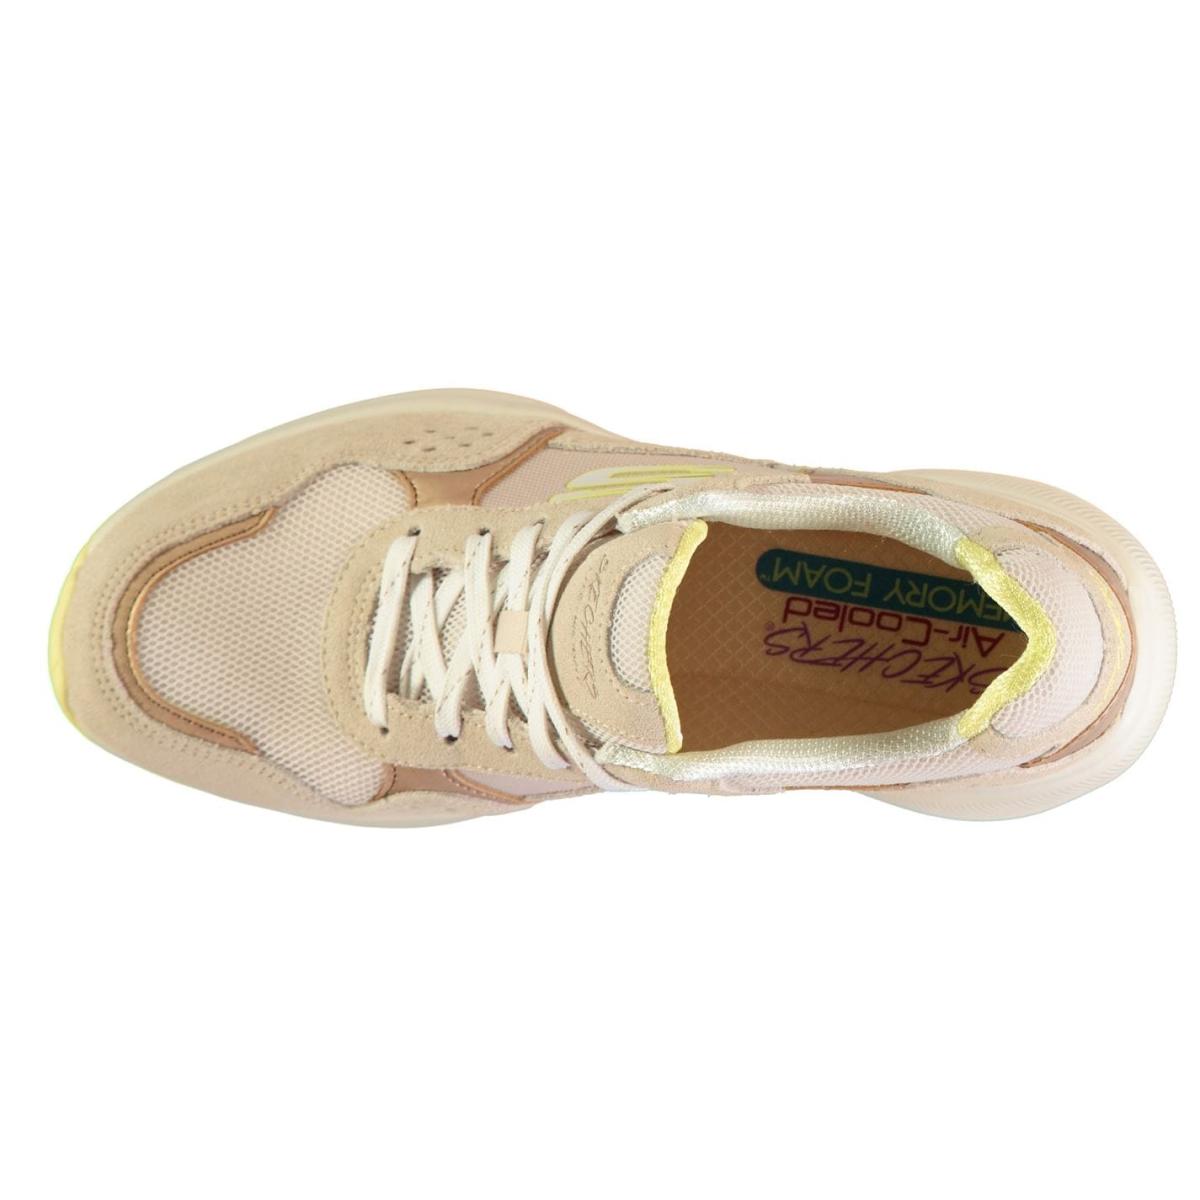 Skechers-Turnschuhe-Damen-Sneaker-Sportschuhe-Laufschuhe-Meridian-1121 Indexbild 7